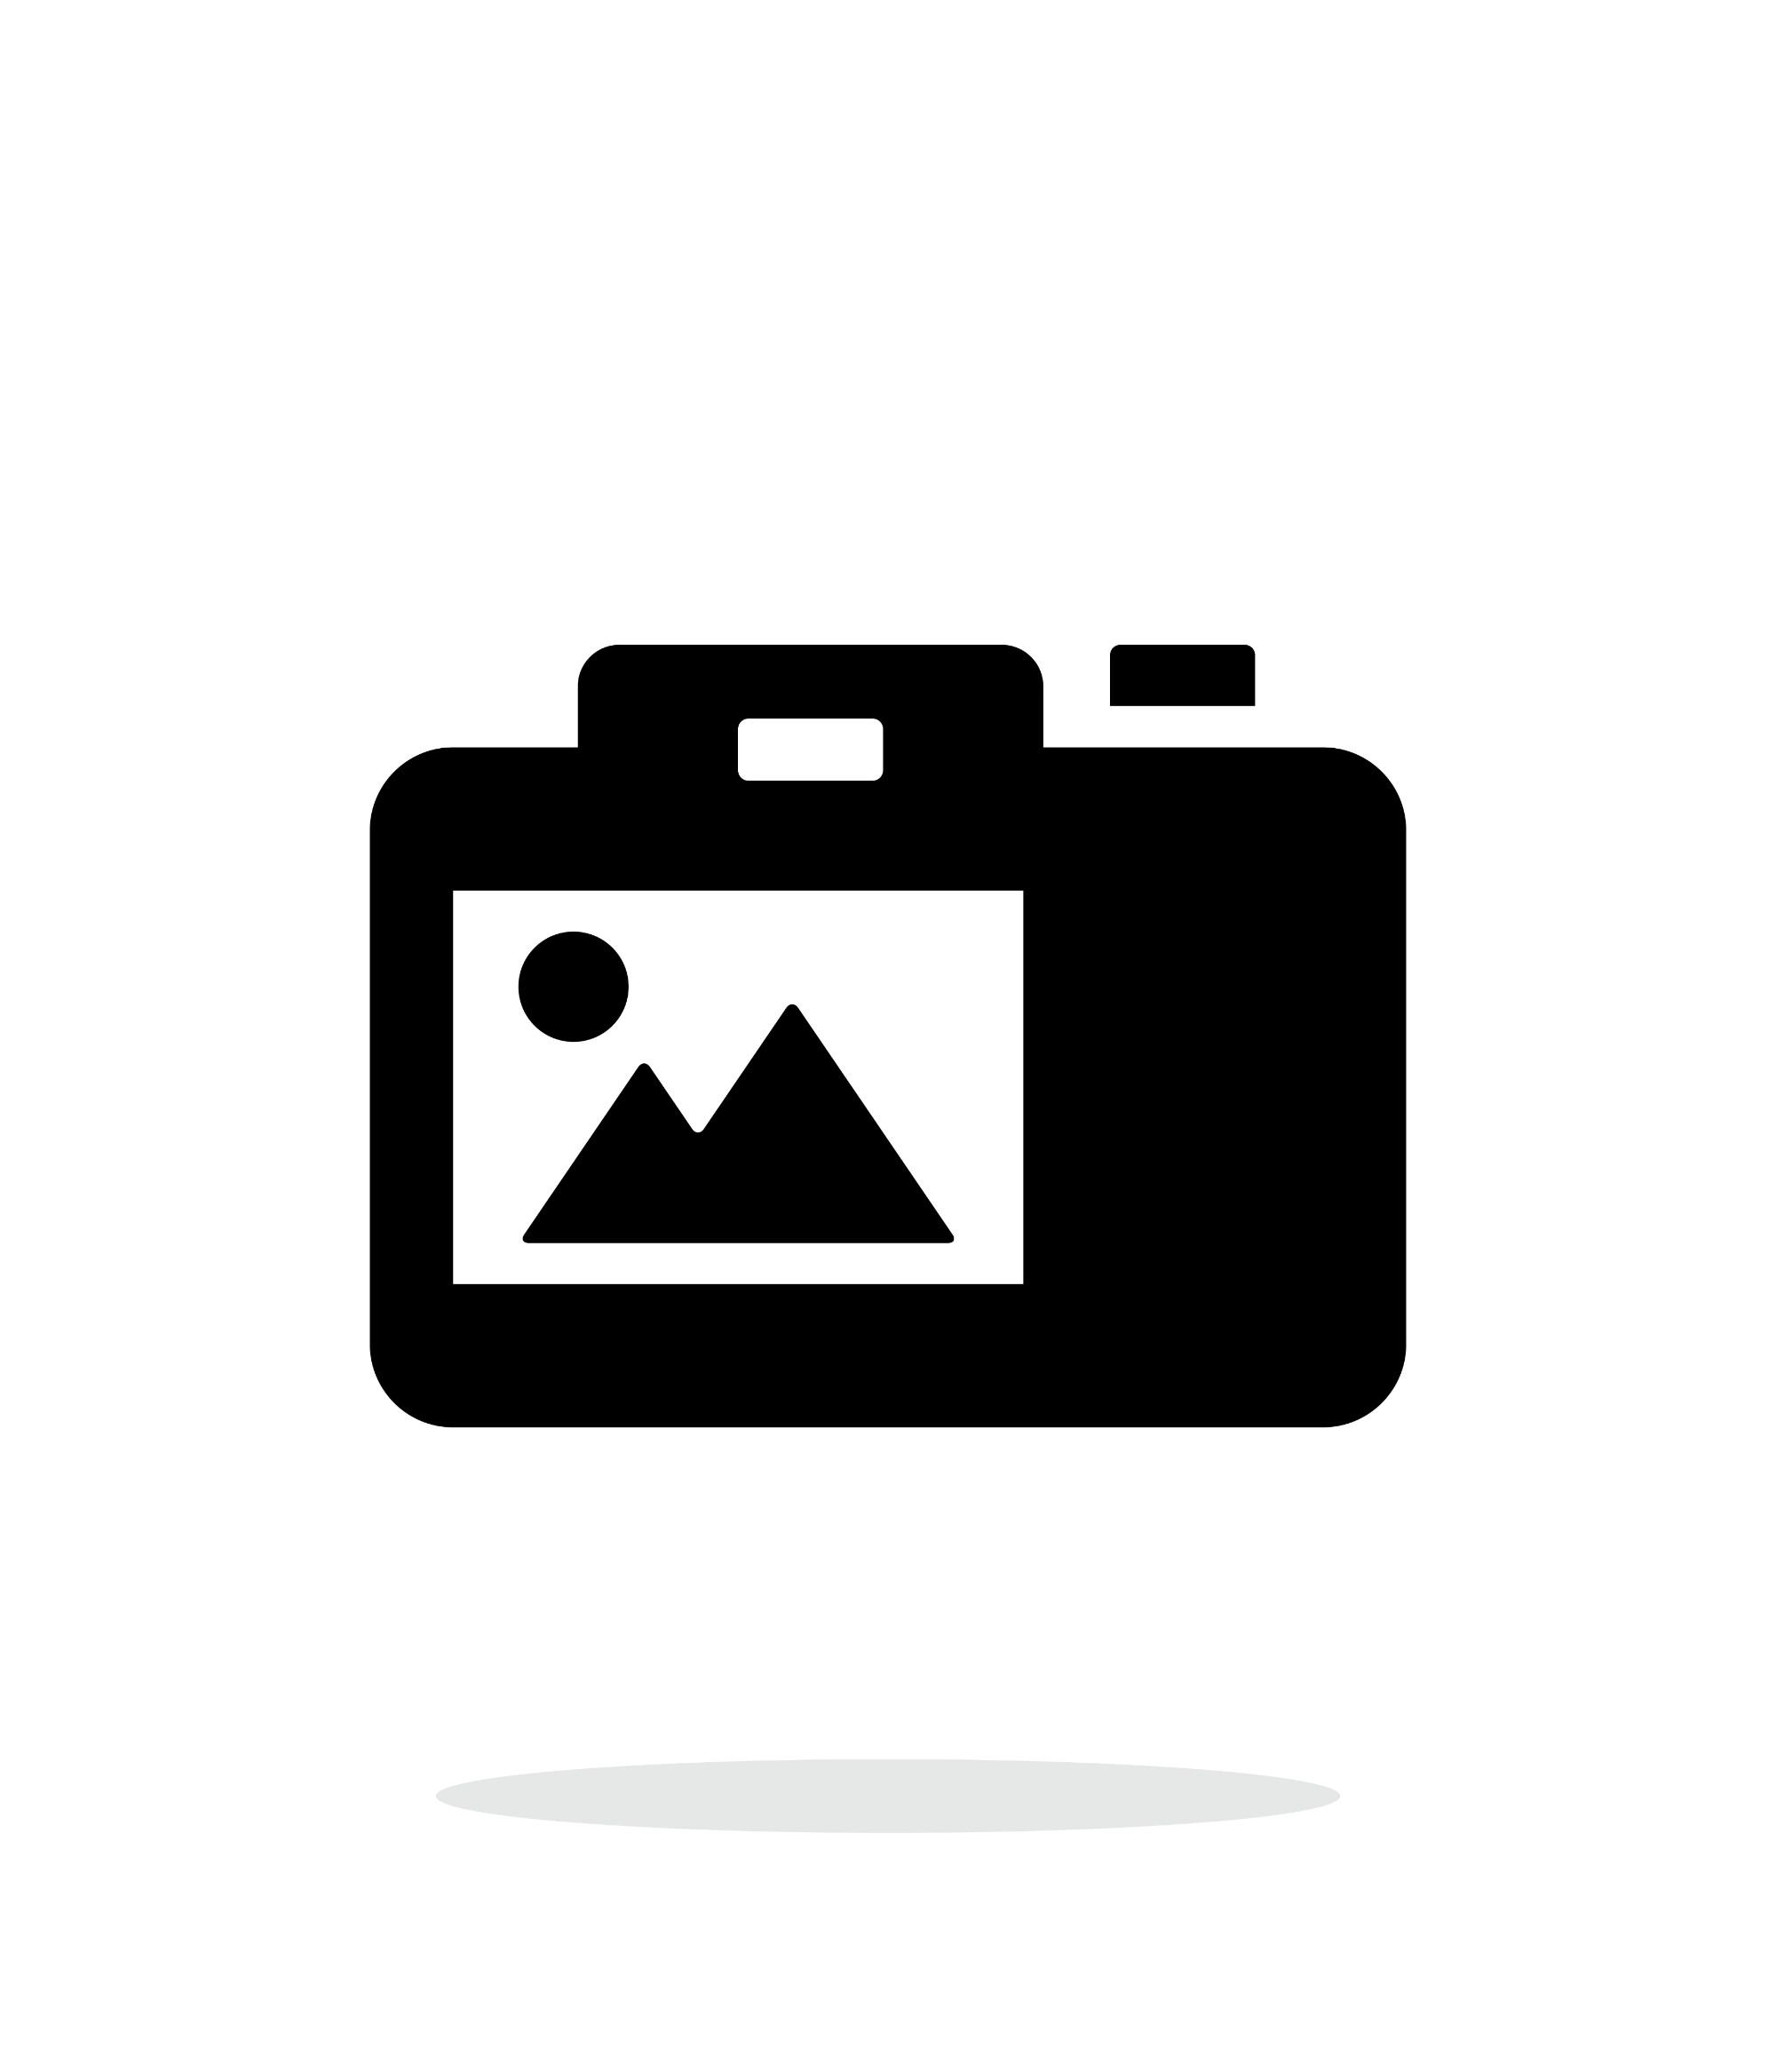 LowRes - Copy.jpg